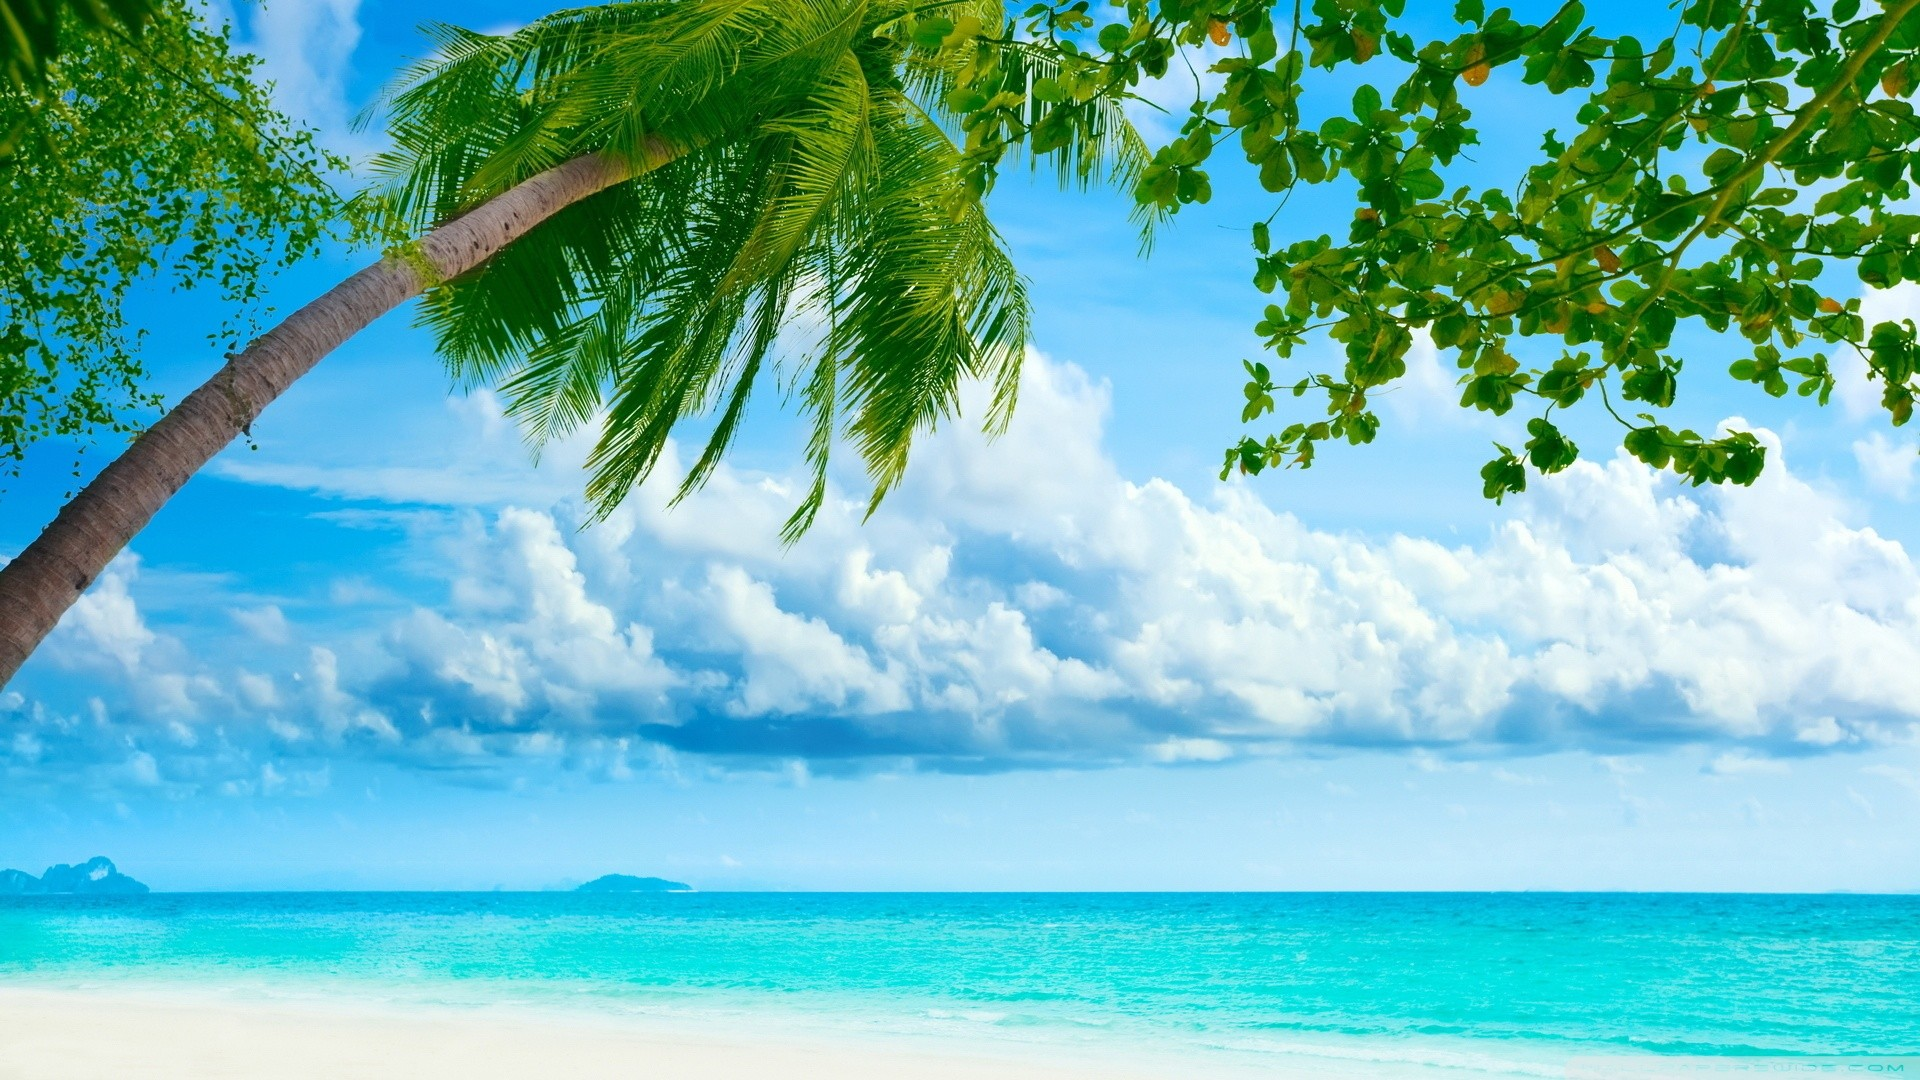 beach tropical hd wallpaper | wallpapers55.com - Best Wallpapers for ...